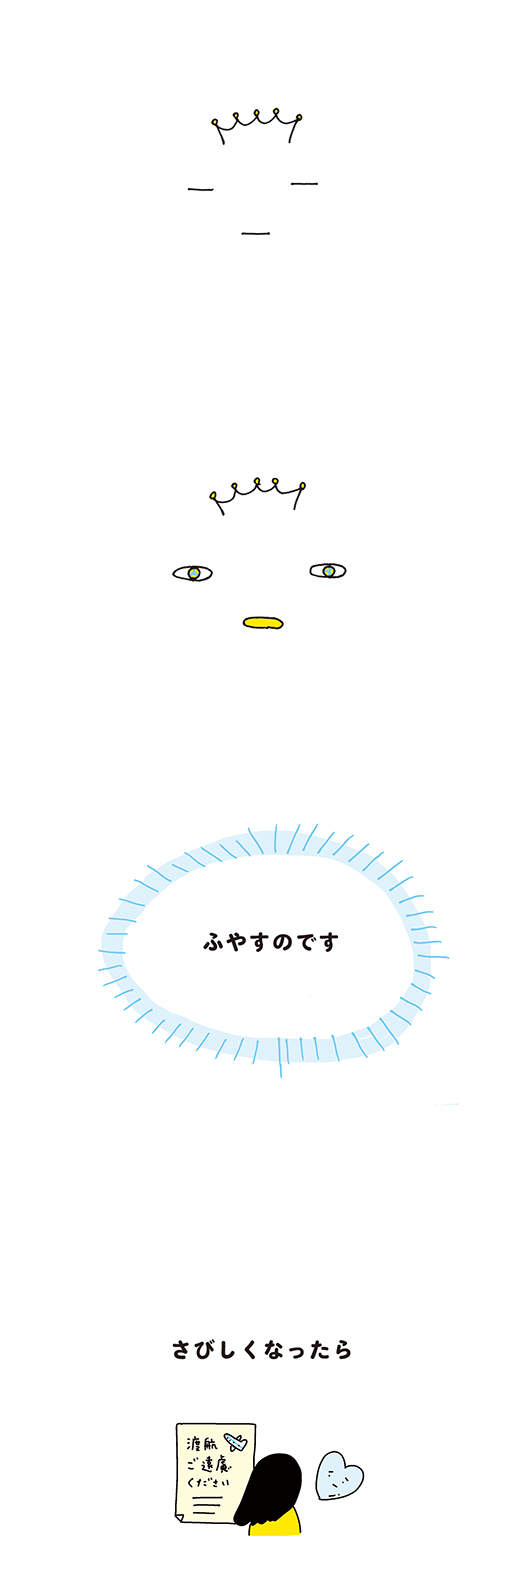 200701_kotaete_01